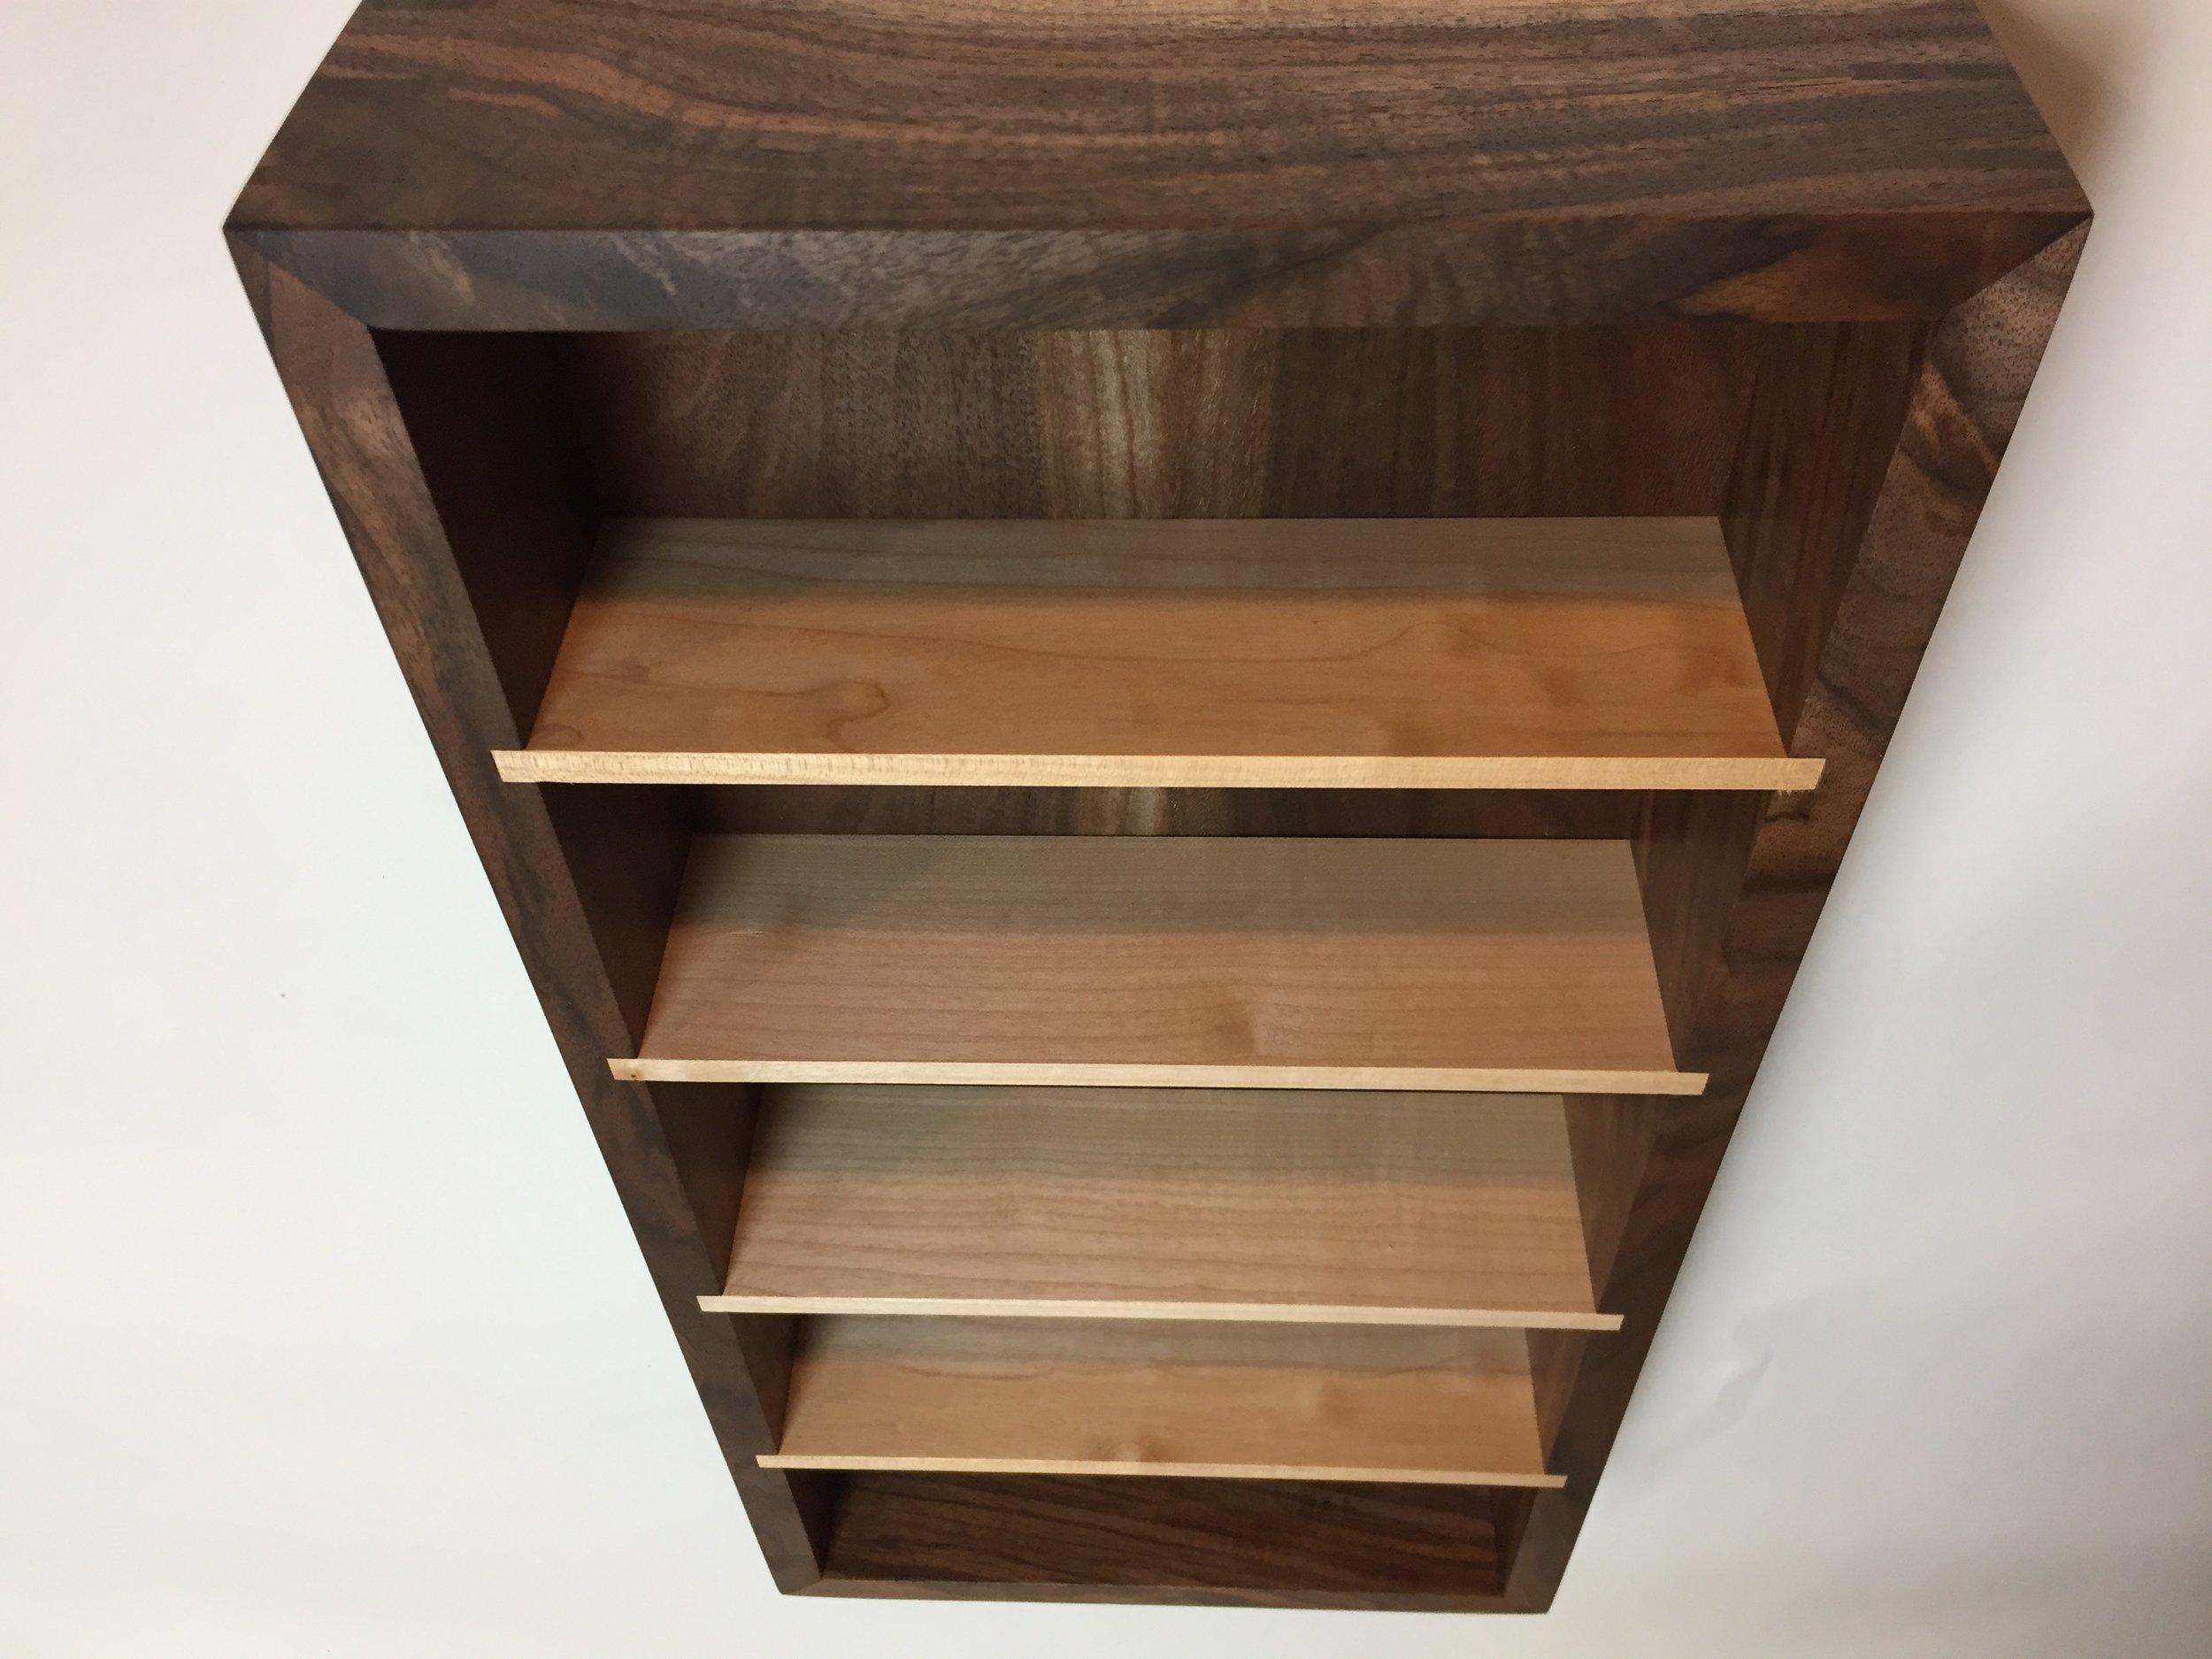 Small display shelf, Oregon black walnut, Western maple shelves.September '17